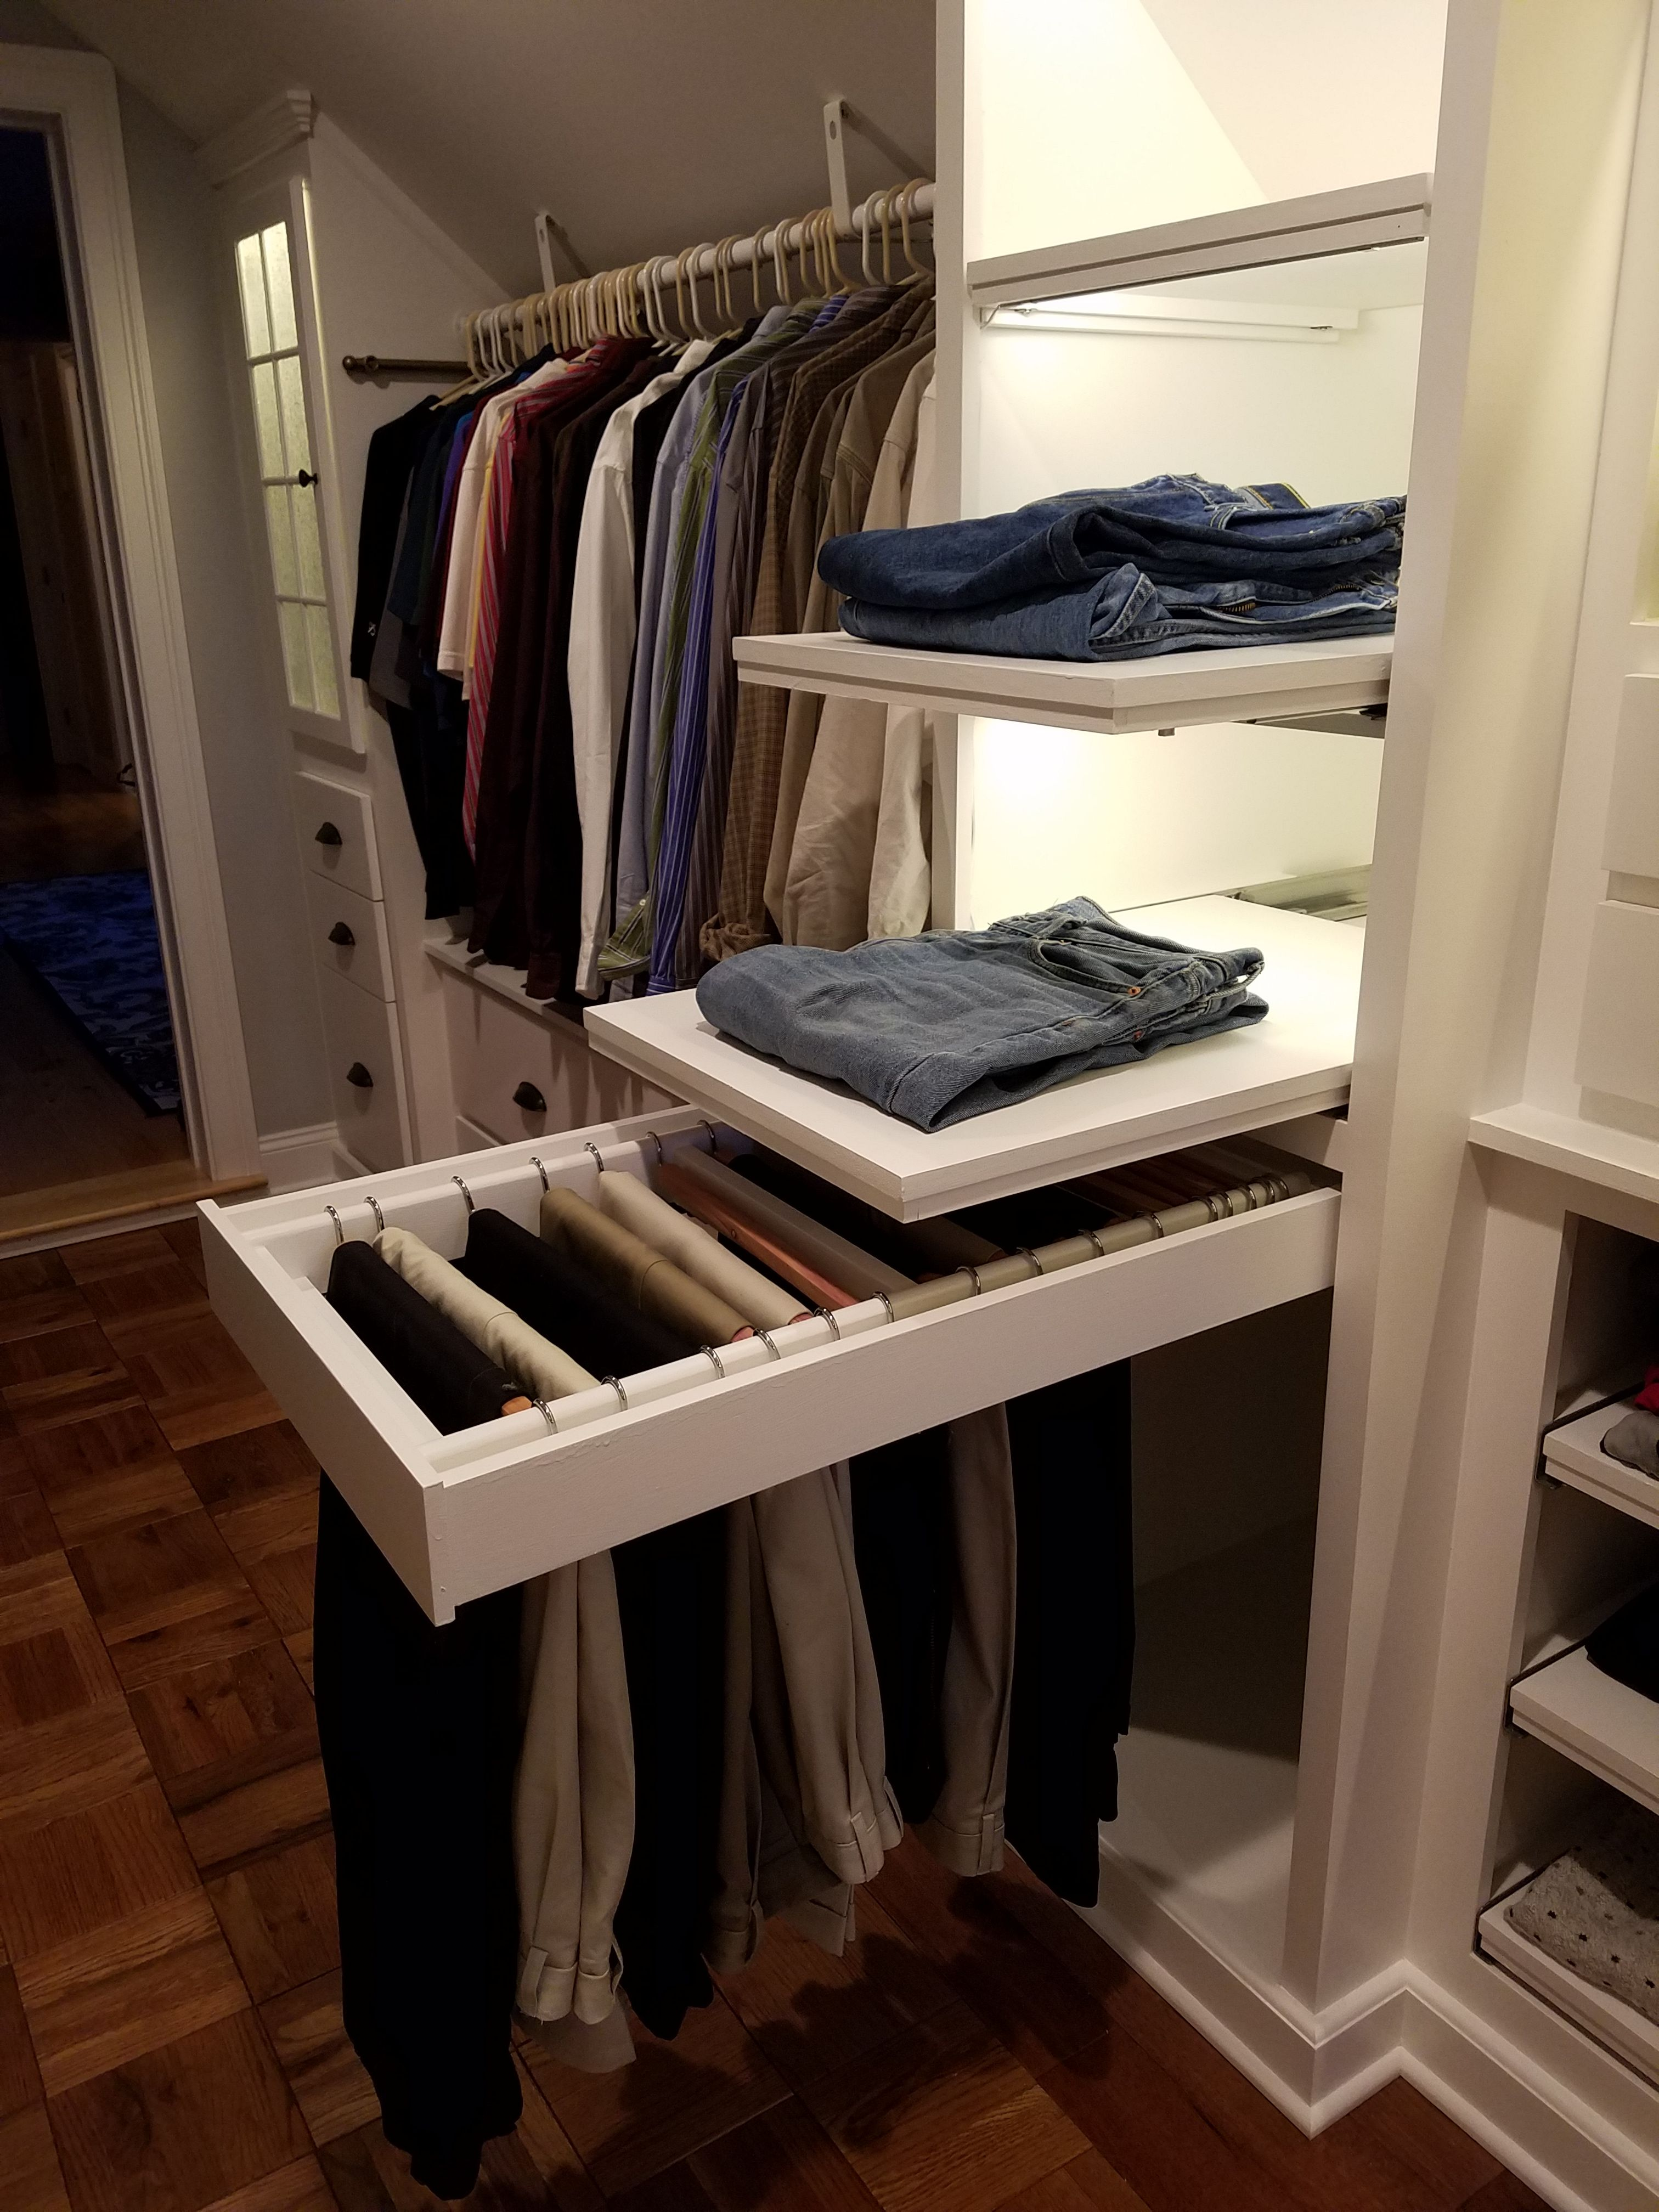 organization blogs vetta tips organize organizing closet rack blog your pants shutterstock